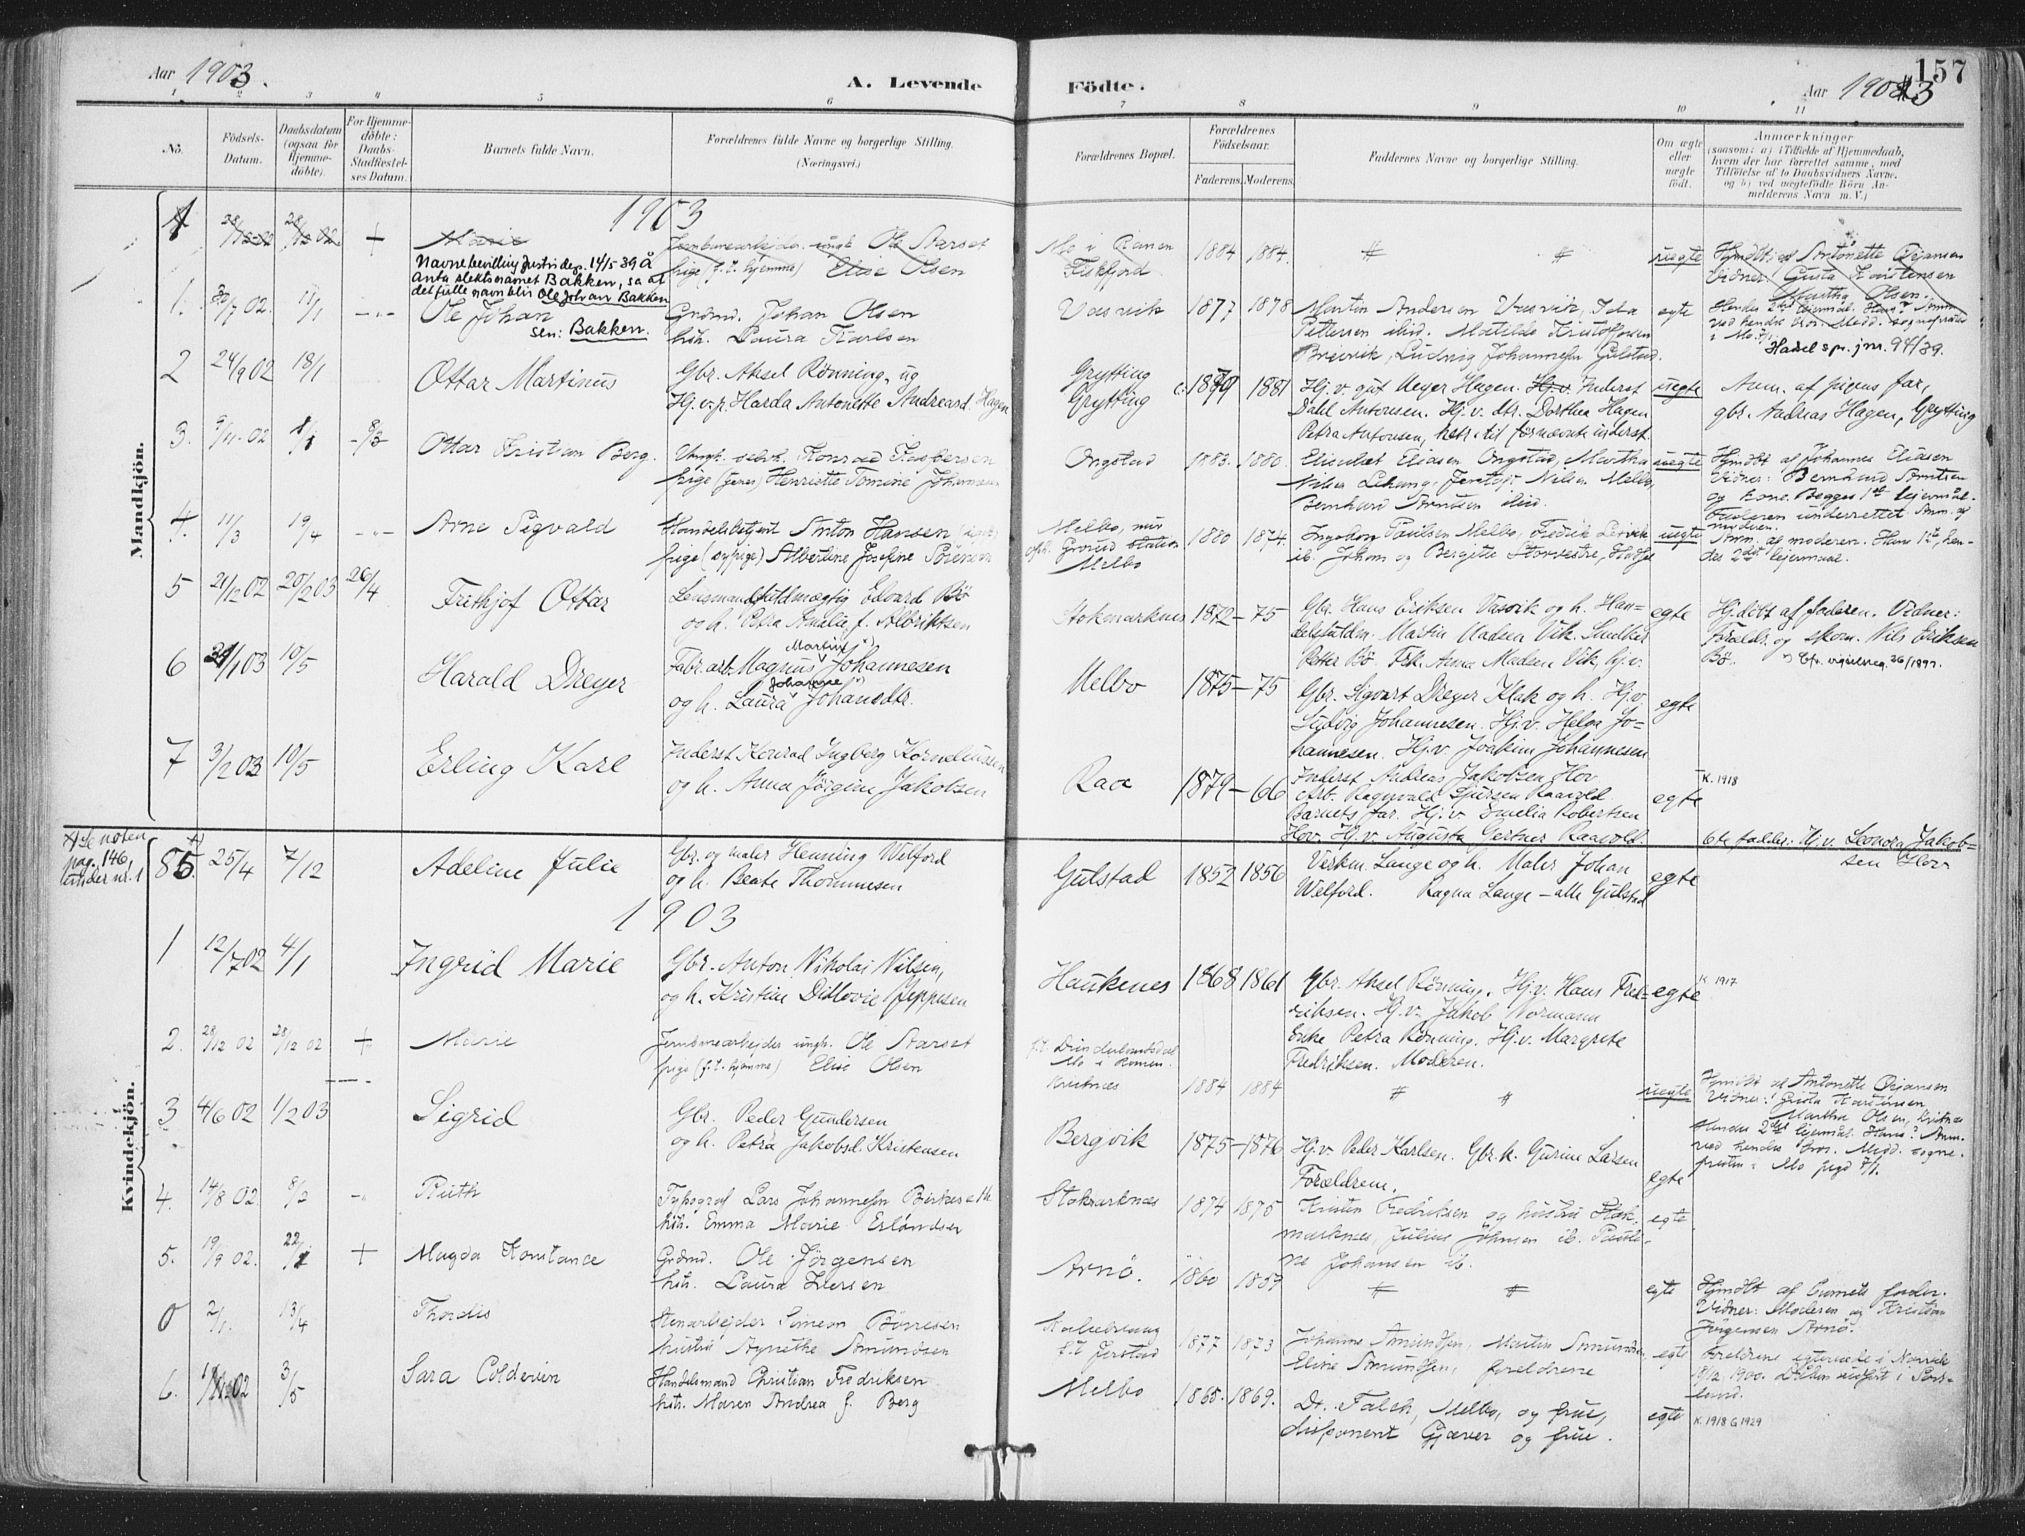 SAT, Ministerialprotokoller, klokkerbøker og fødselsregistre - Nordland, 888/L1246: Ministerialbok nr. 888A12, 1891-1903, s. 157